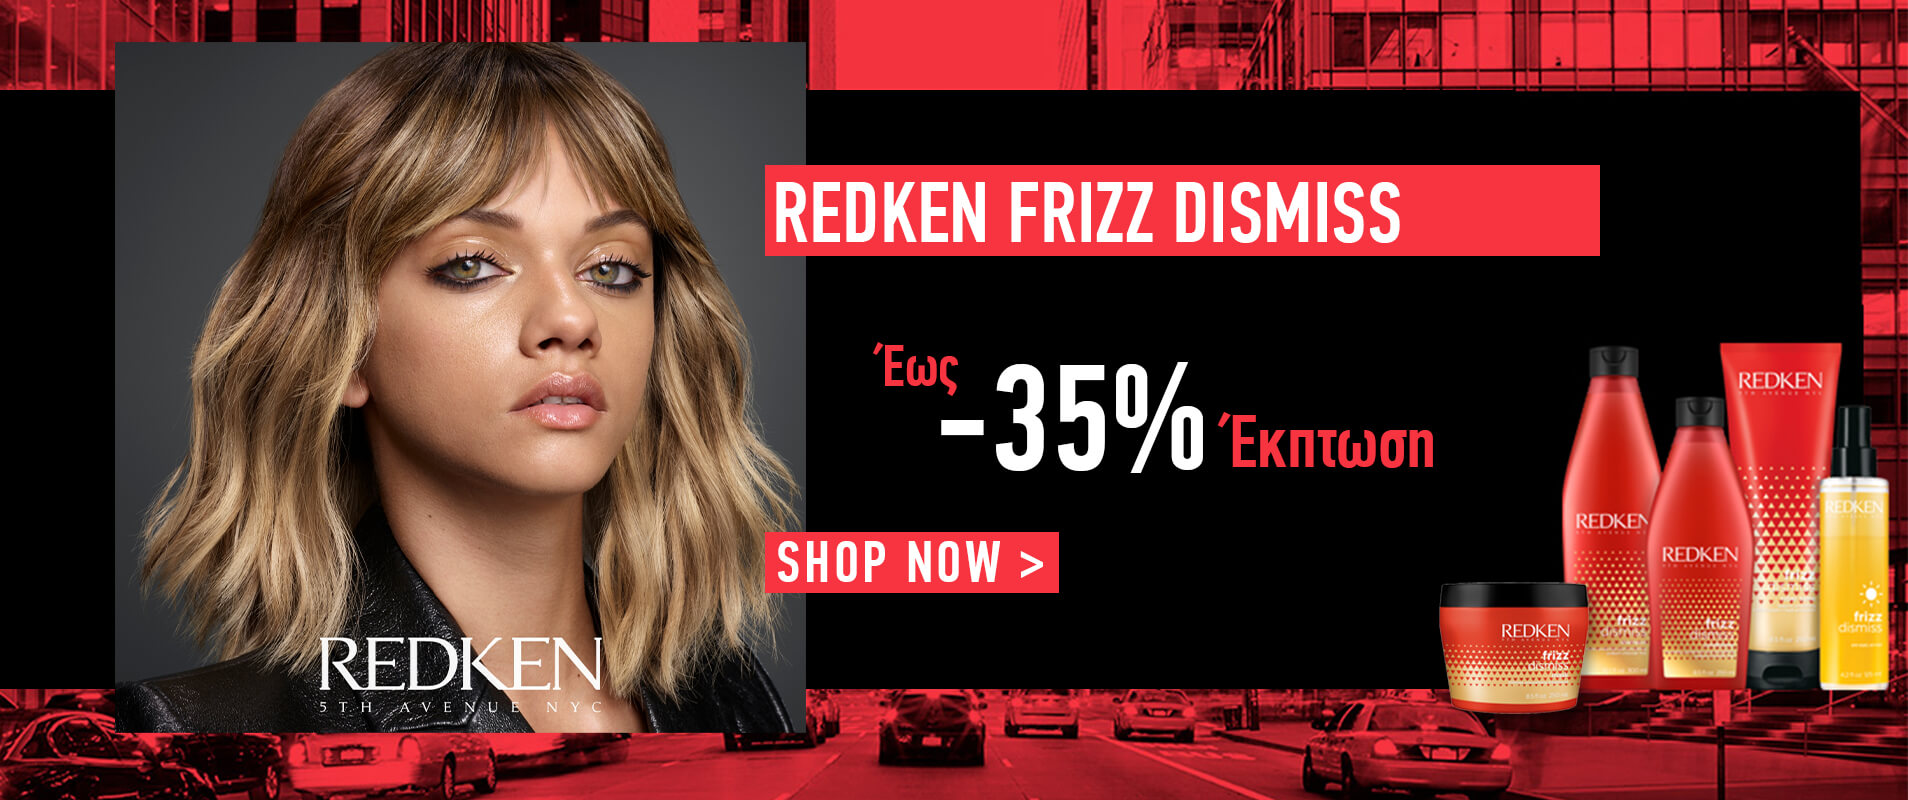 slider-redken-frizz-dismiss-offer-kaizen-shop-1.jpg